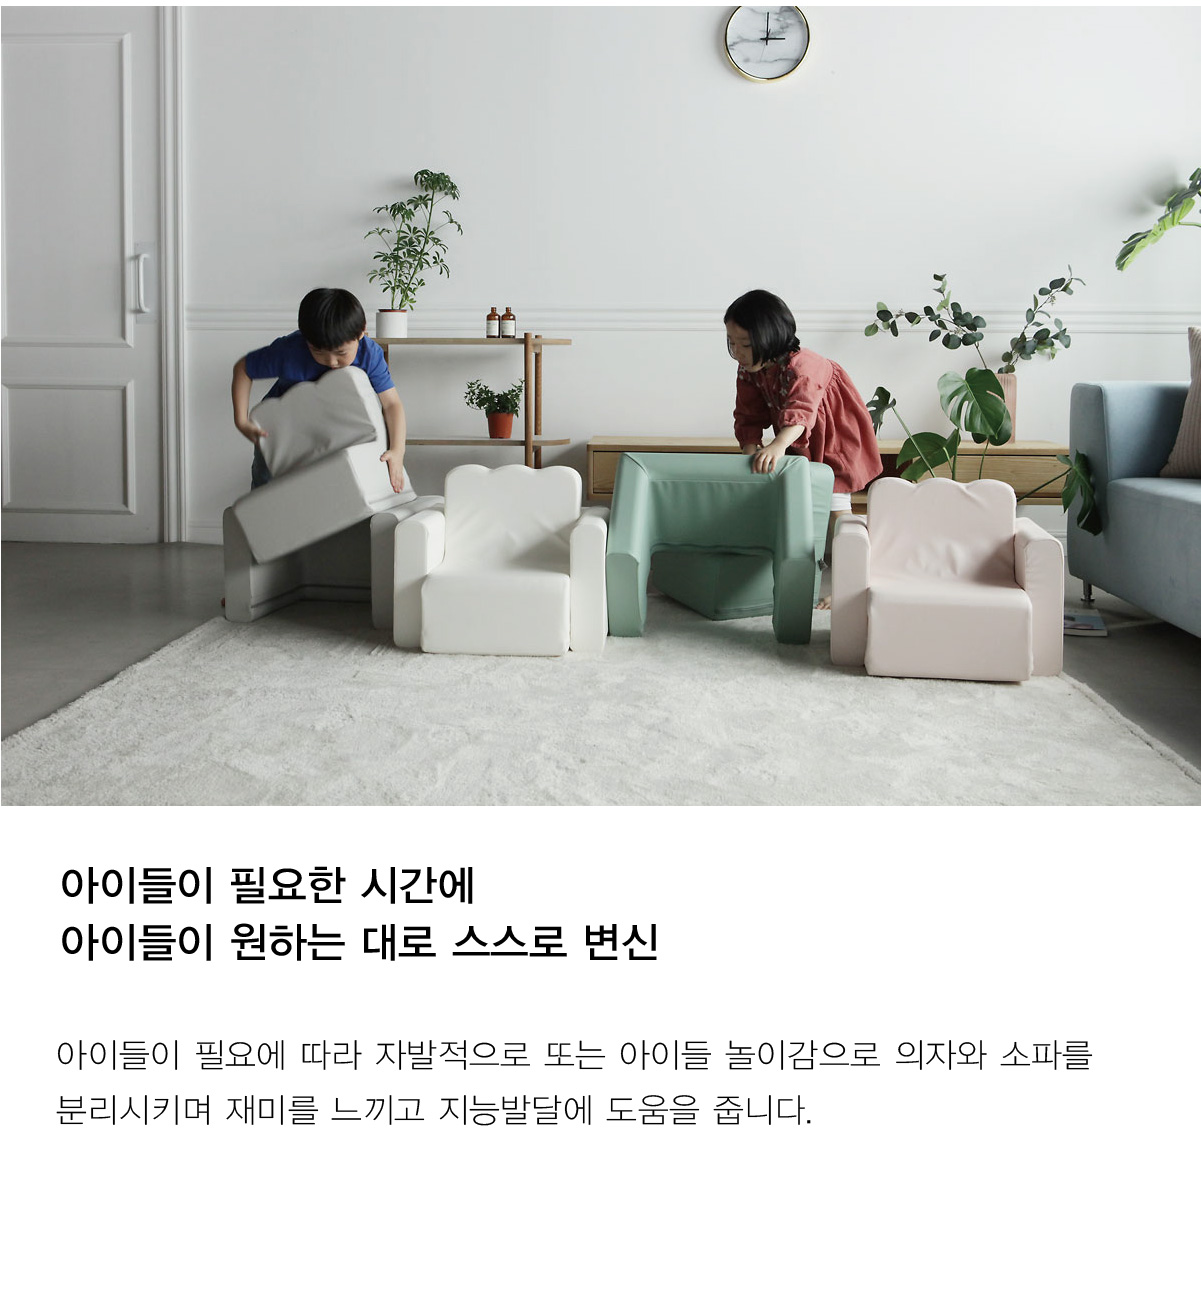 BREAD 유아책상소파 선물추천 - 세레스홈, 150,000원, 가구, 소파